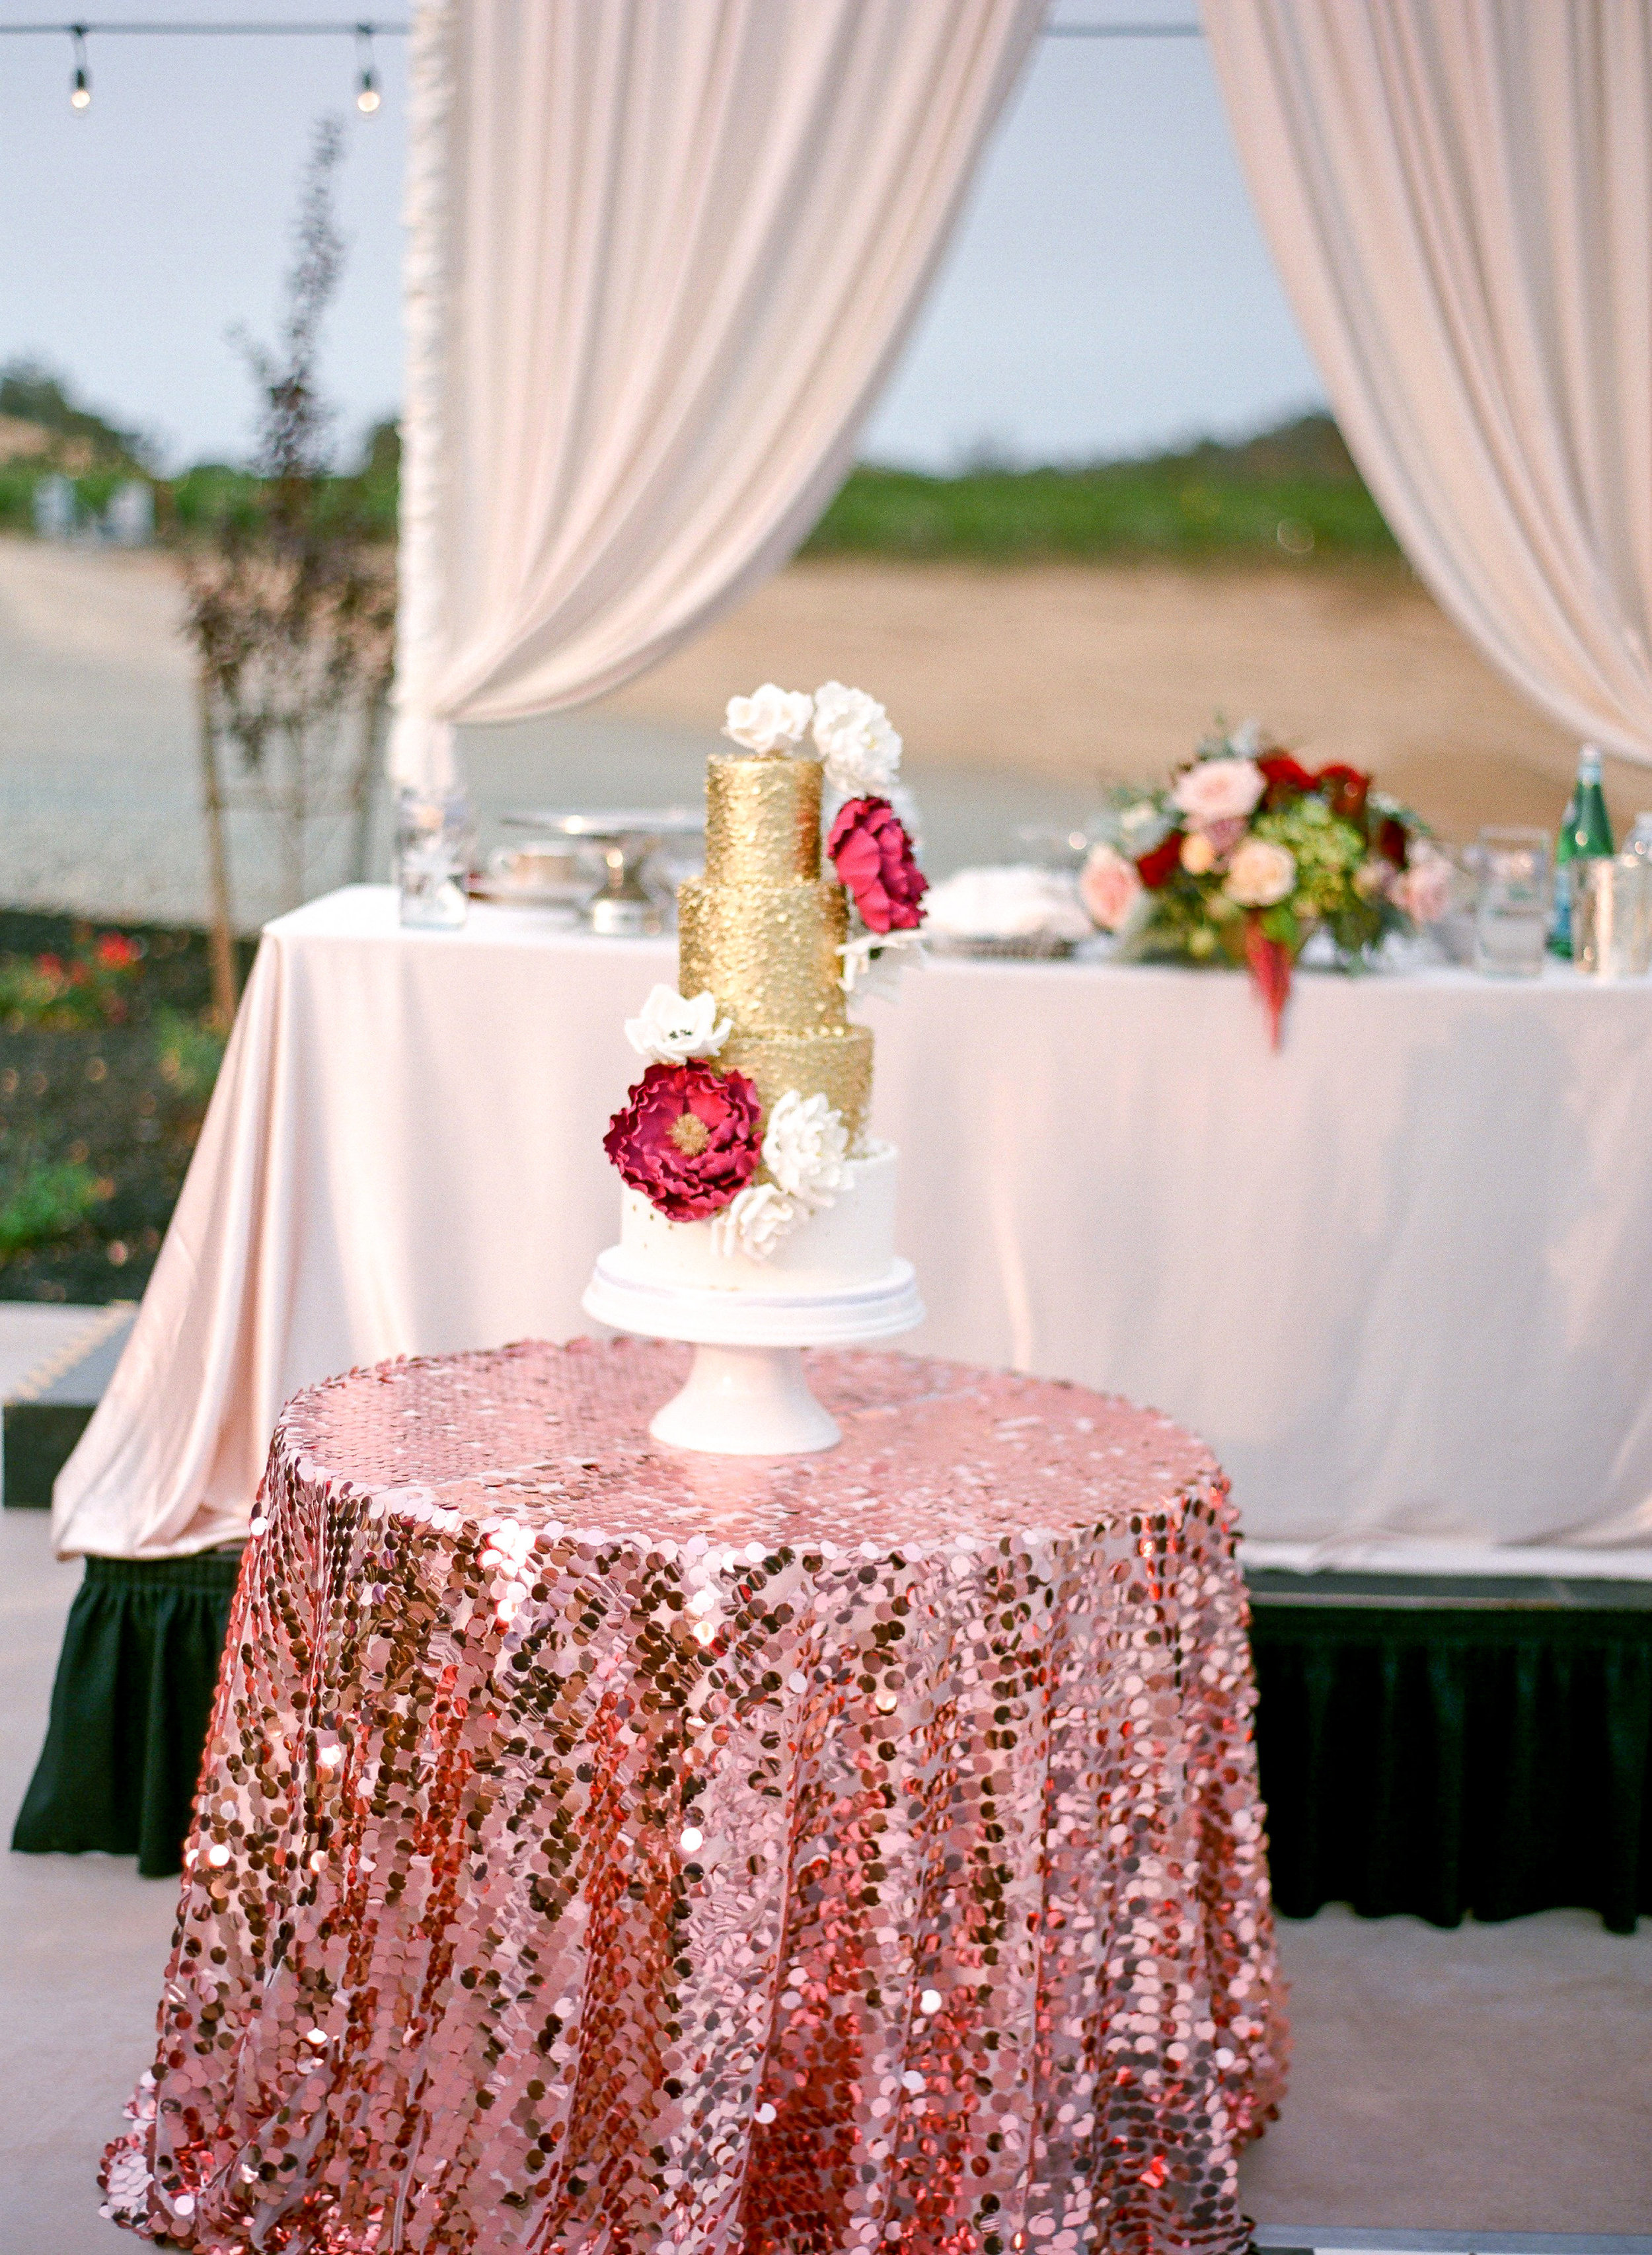 Amador_County_Wedding_Cake_Table_Sequin_Drapping_Rancho_Victoria_Vineyard_Northern_California.jpg